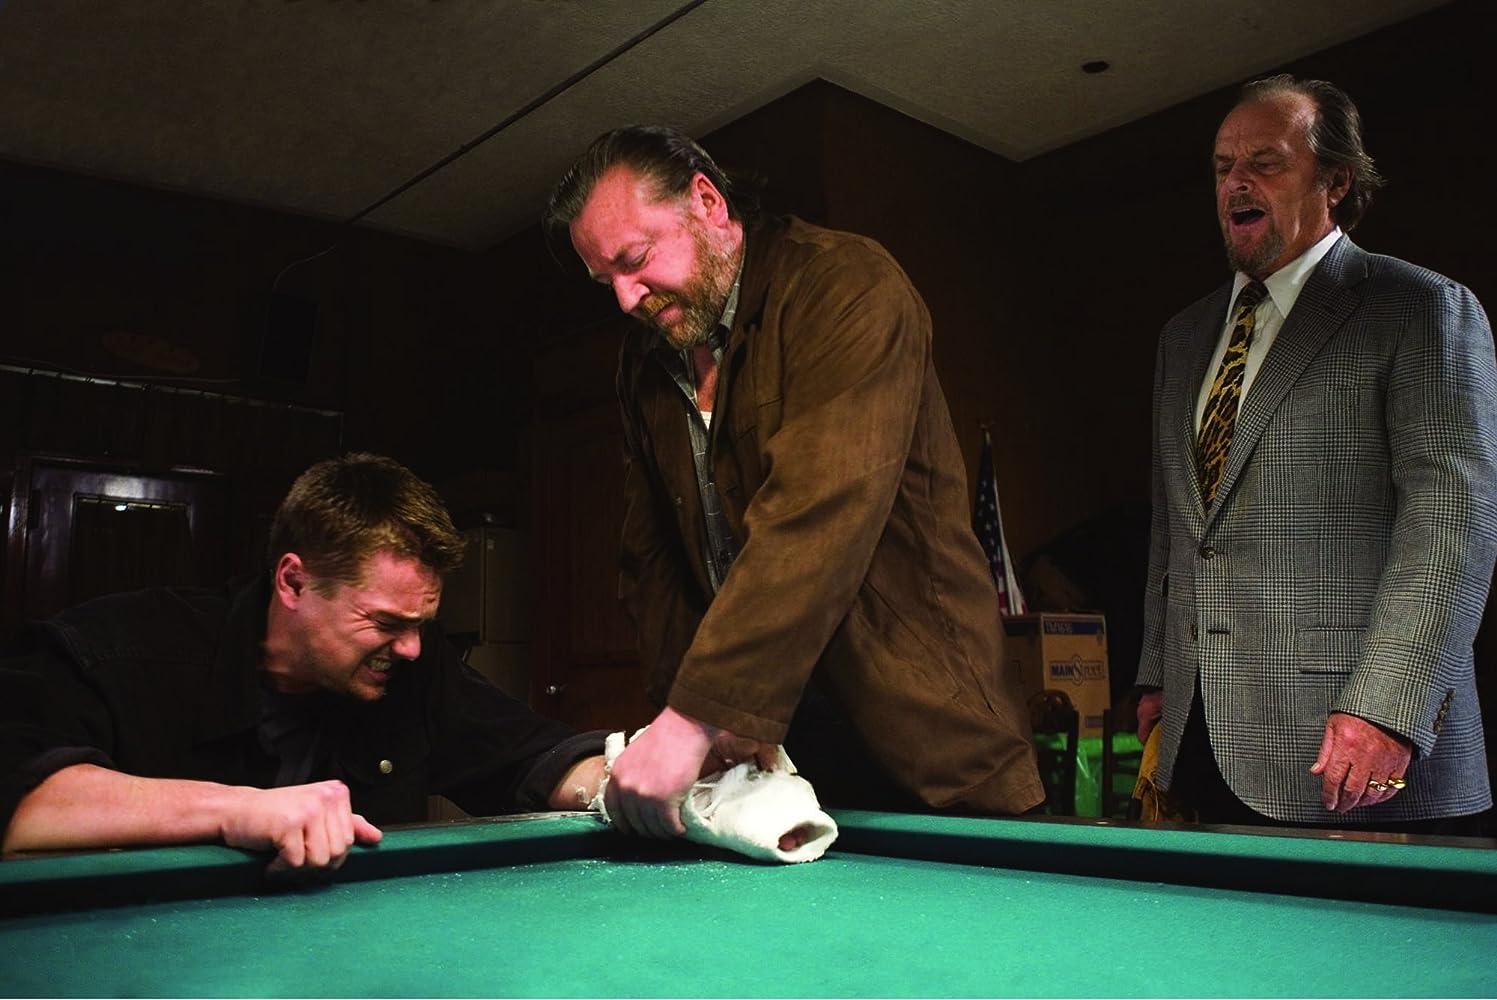 Leonardo DiCaprio, Jack Nicholson és Ray Winstone a távozóban (2006)